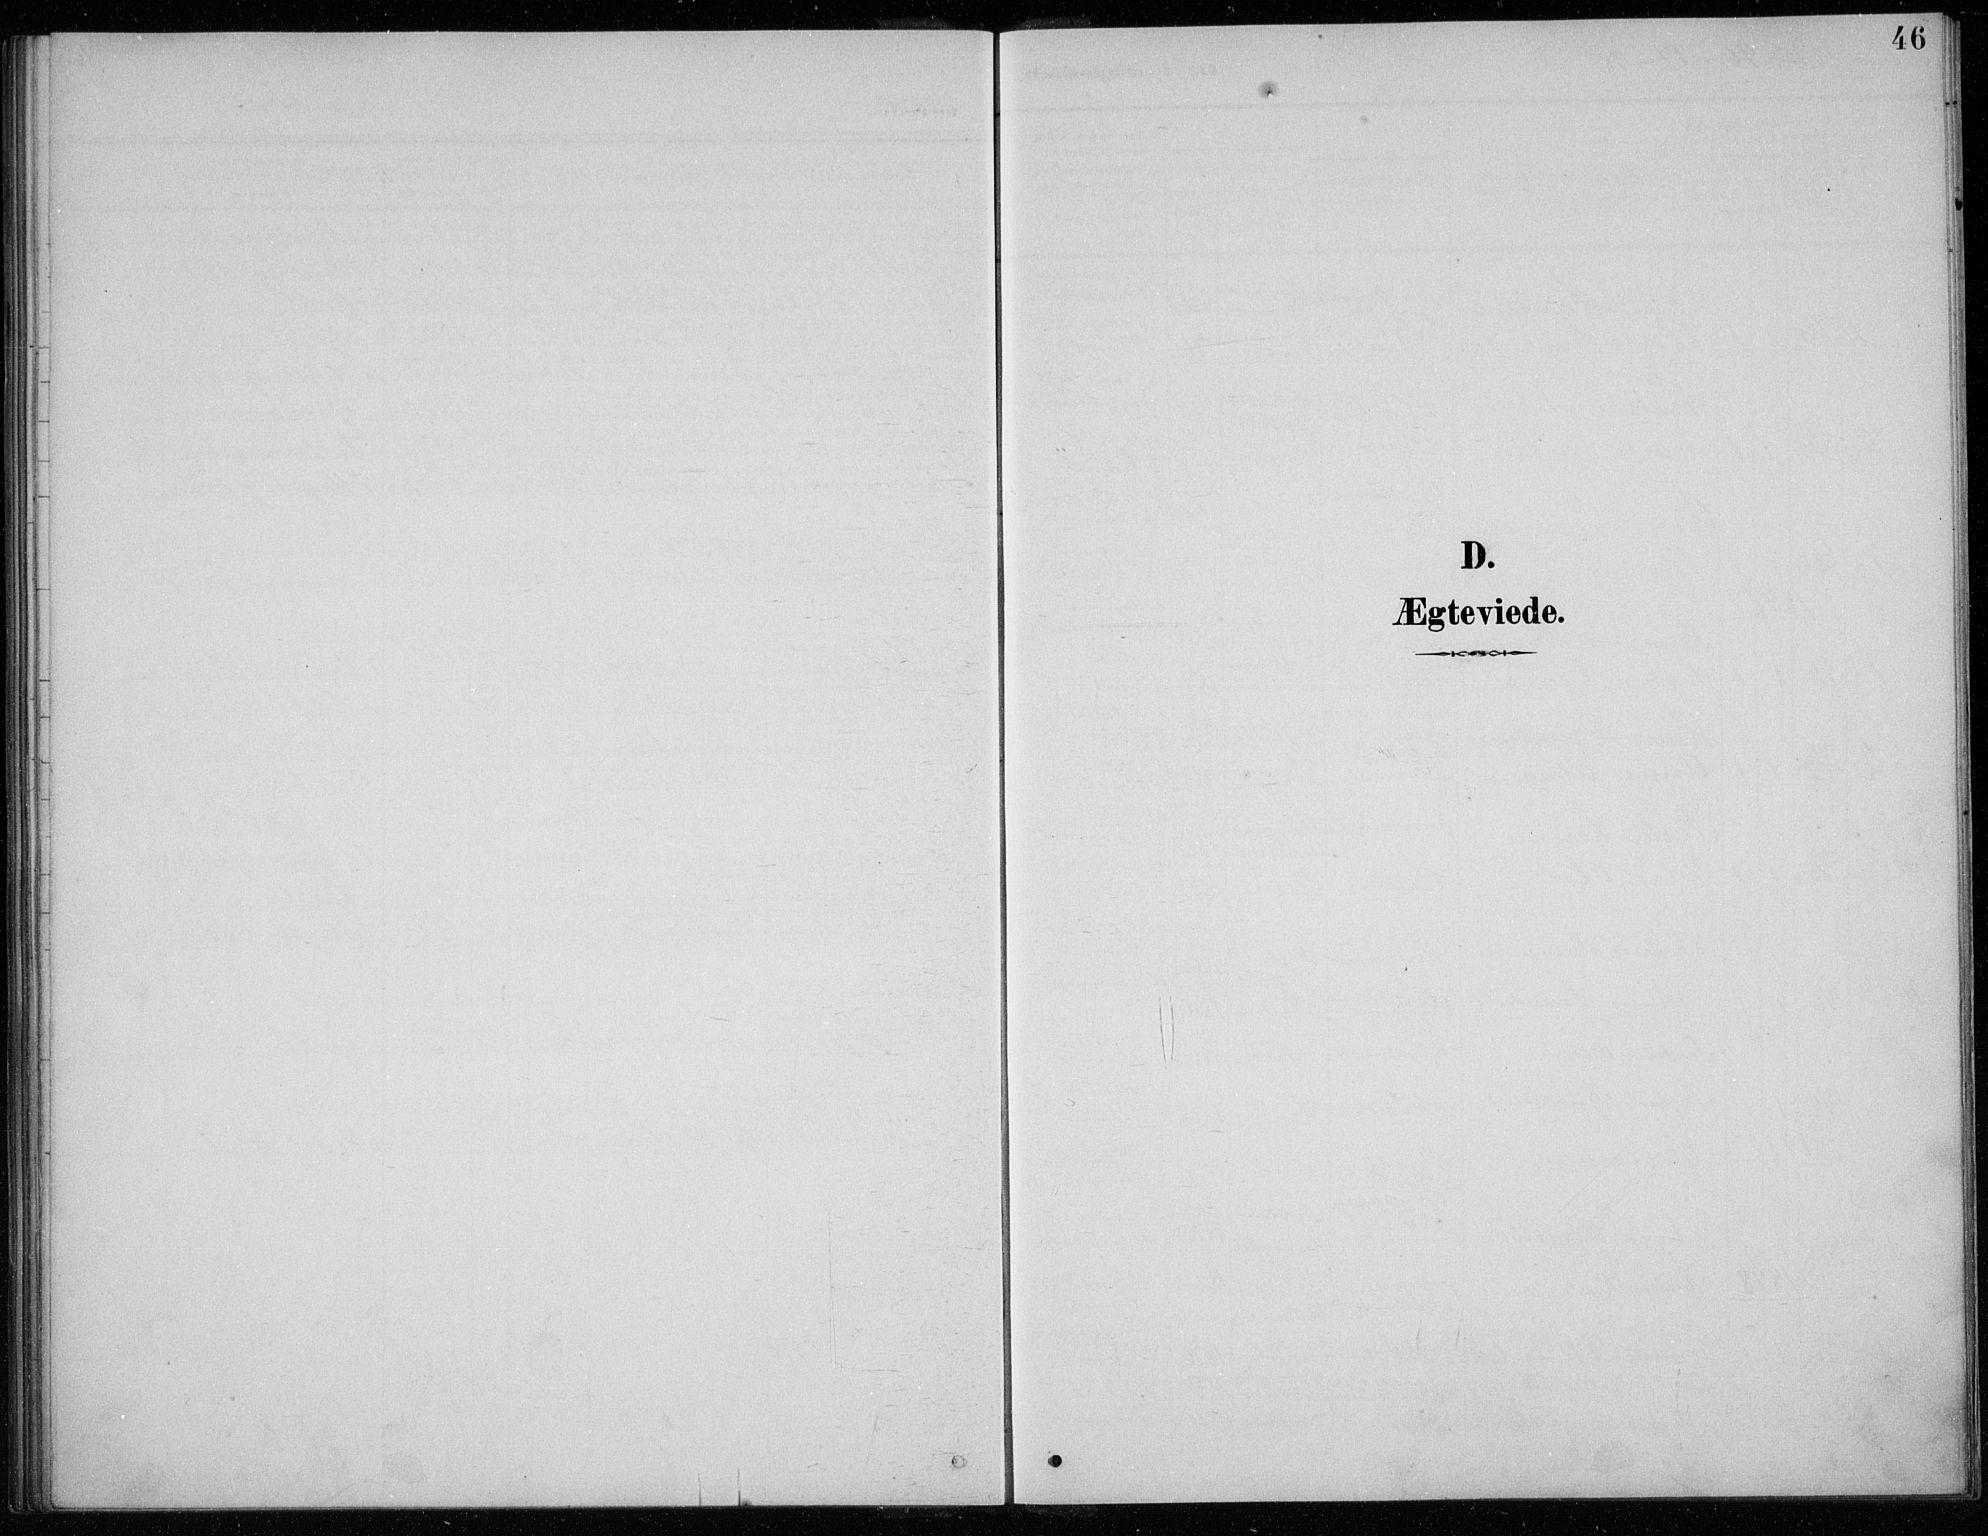 SAB, Balestrand sokneprestembete, H/Hab/Habc/L0003: Parish register (copy) no. C 3, 1895-1927, p. 46